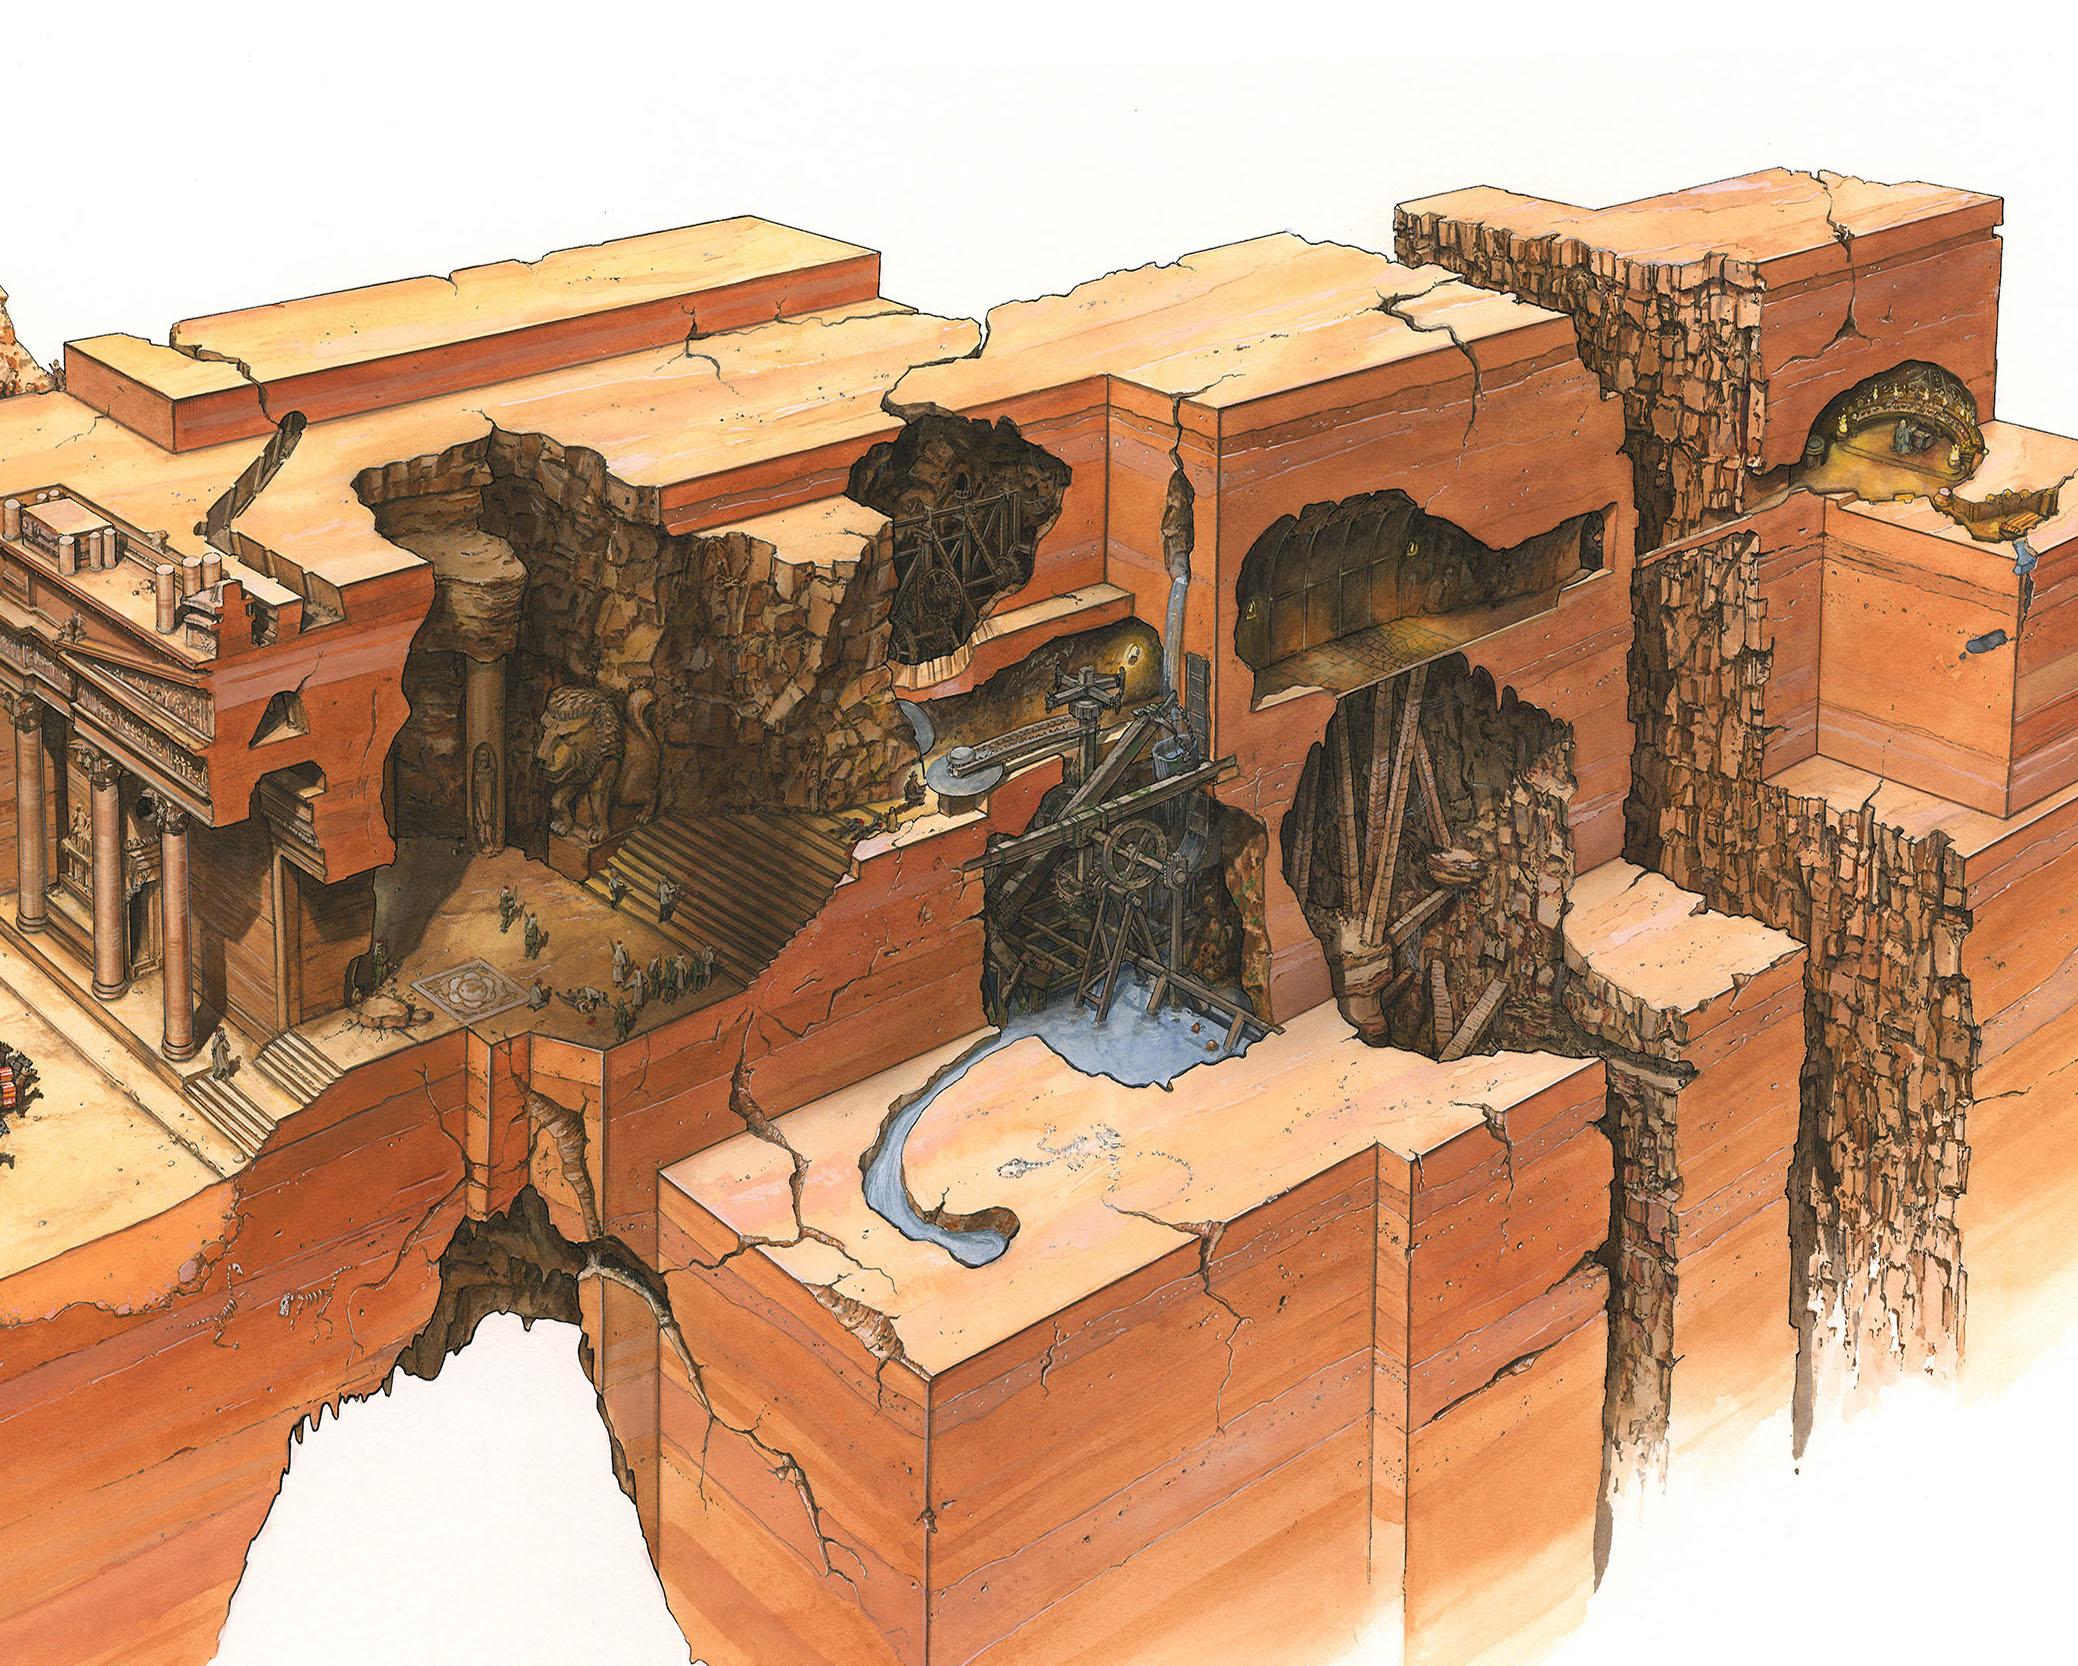 Richard Chasemore Illustrations